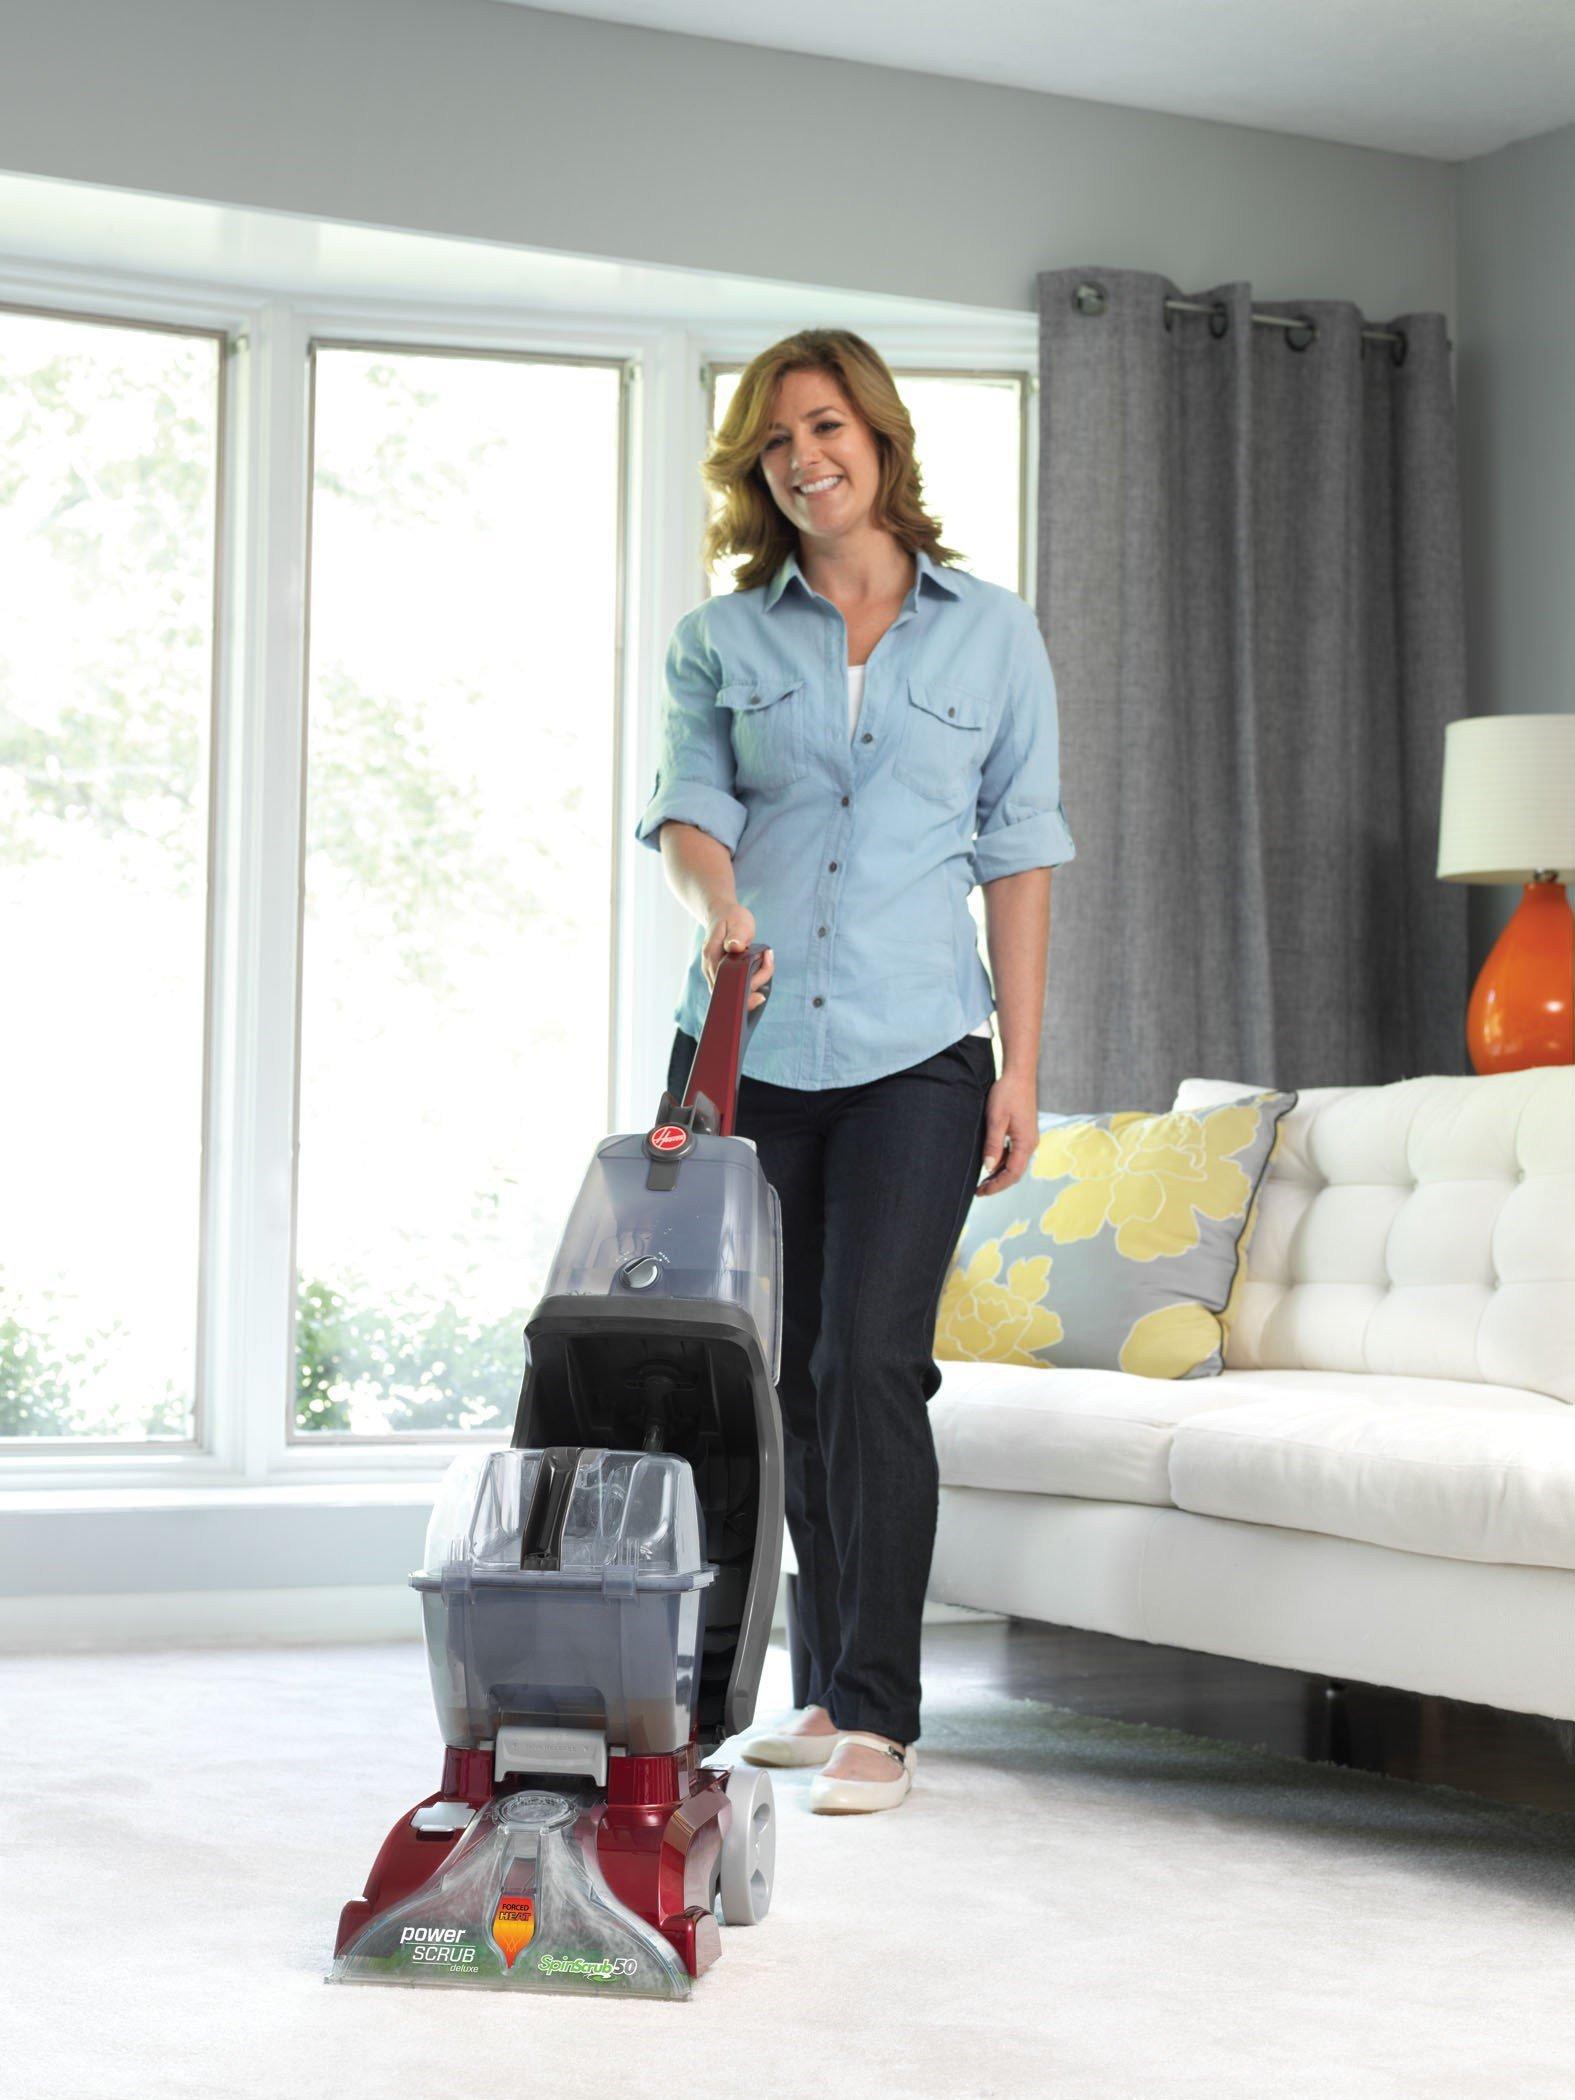 Power Scrub Deluxe Multifloor Carpet Cleaner3